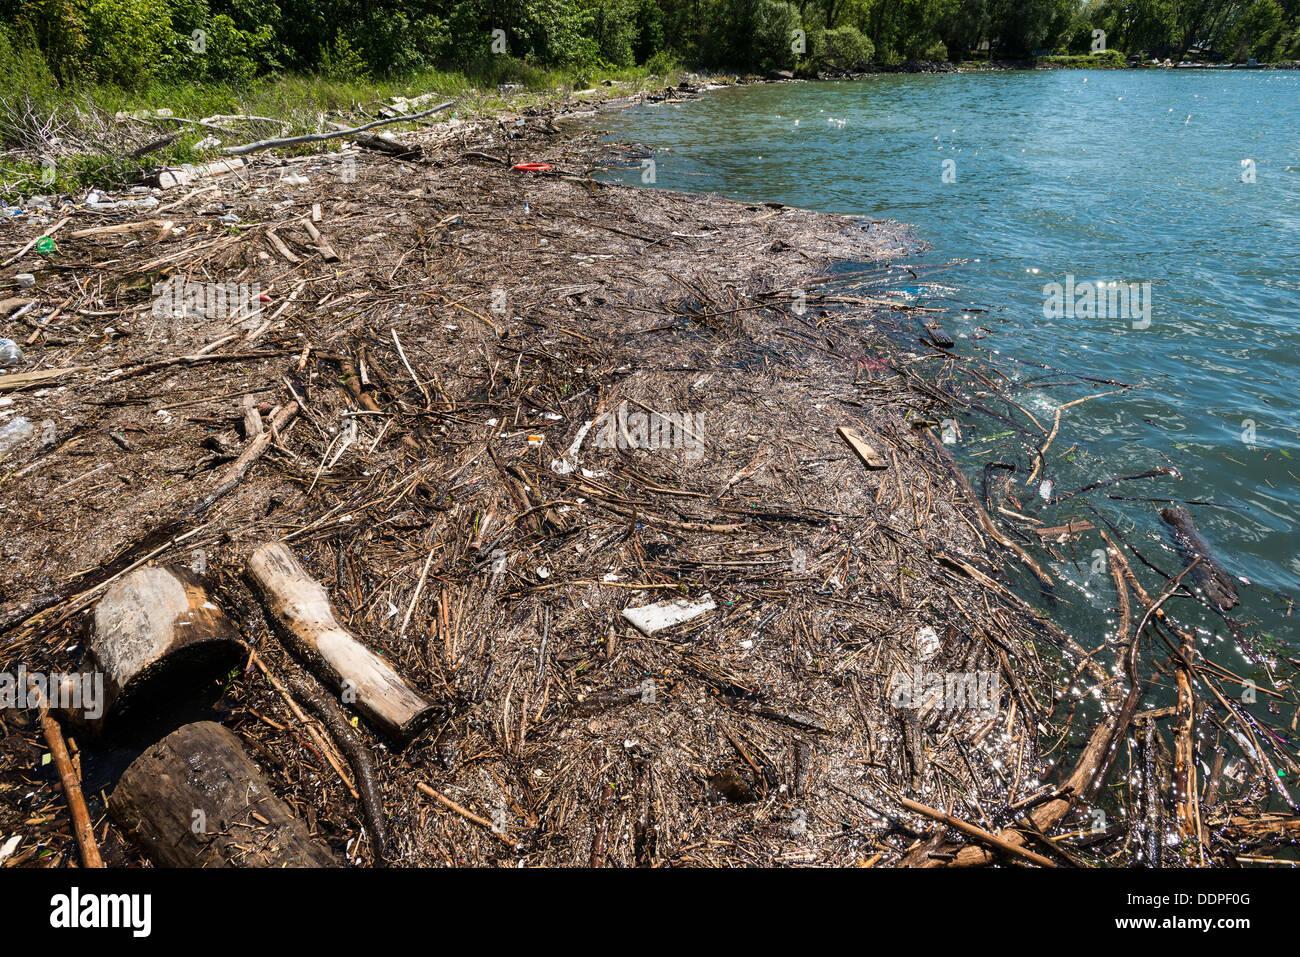 Scum and debris in the water, Ward's Island, Toronto Island Park, Toronto, Ontario, Canada. - Stock Image